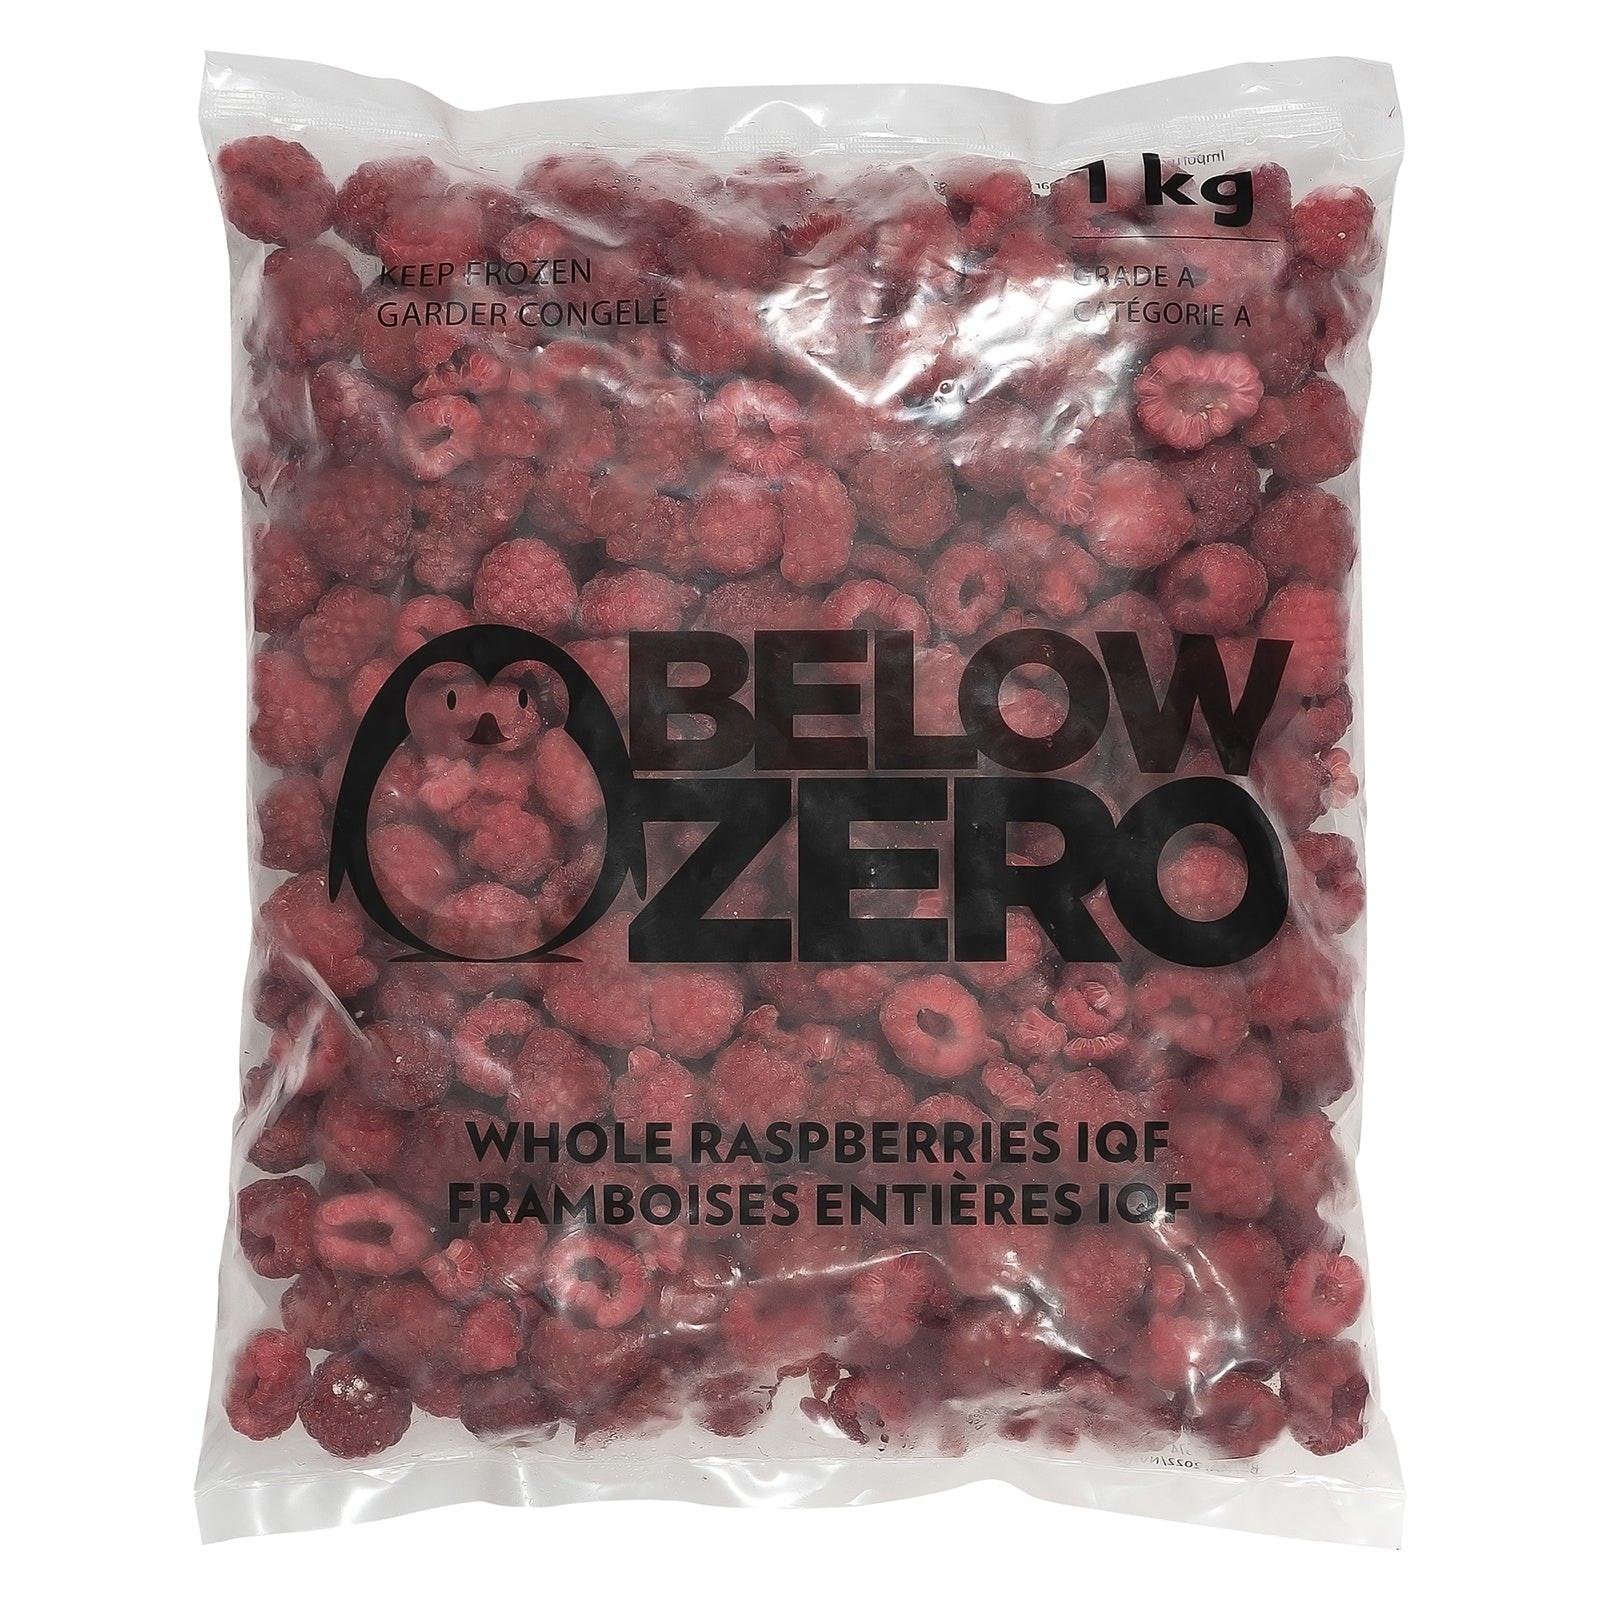 BELOW ZERO Whole raspberries